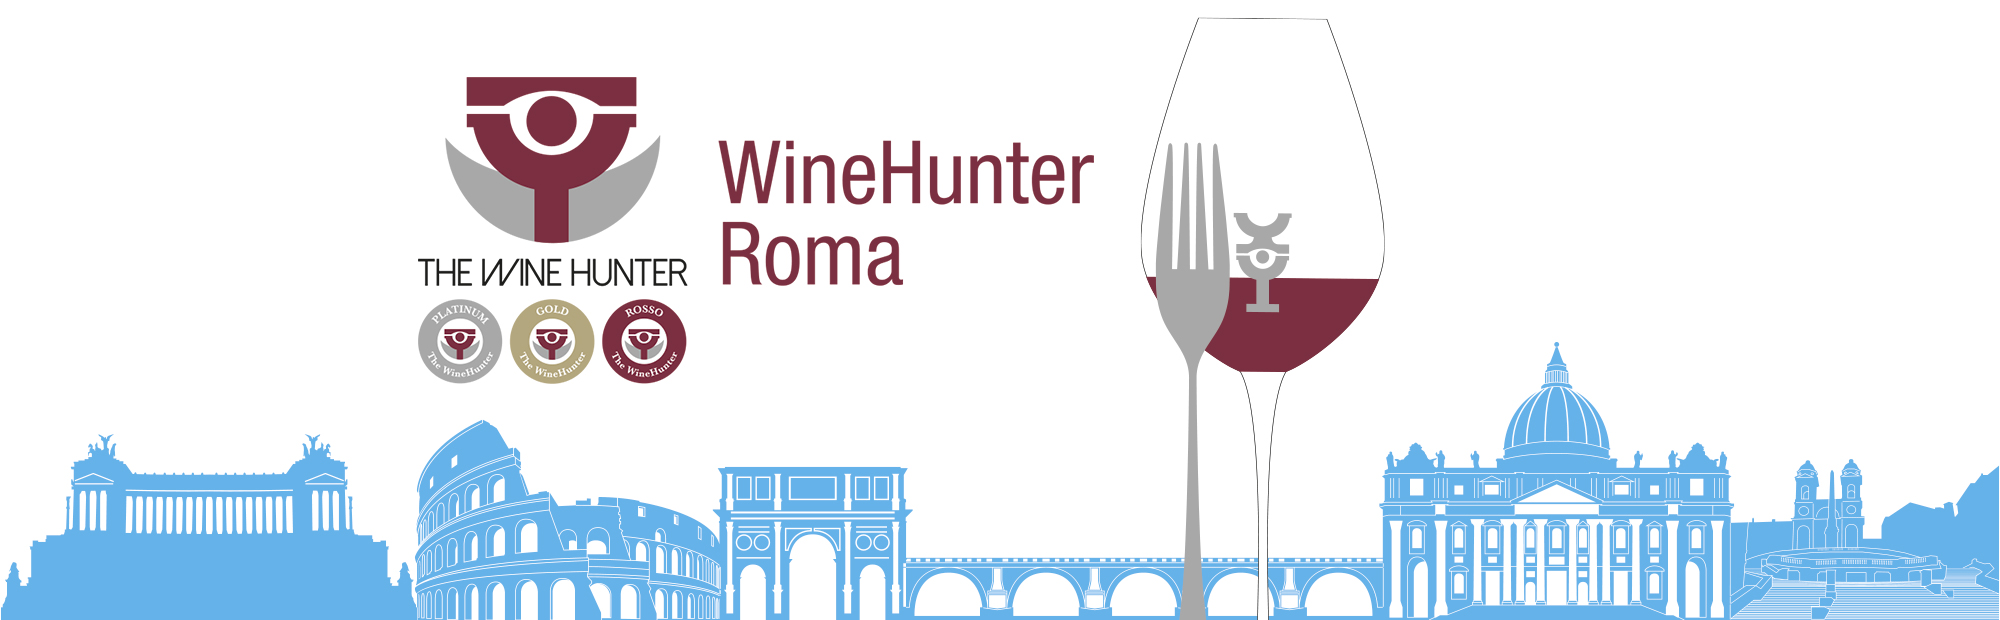 WineHunter Roma